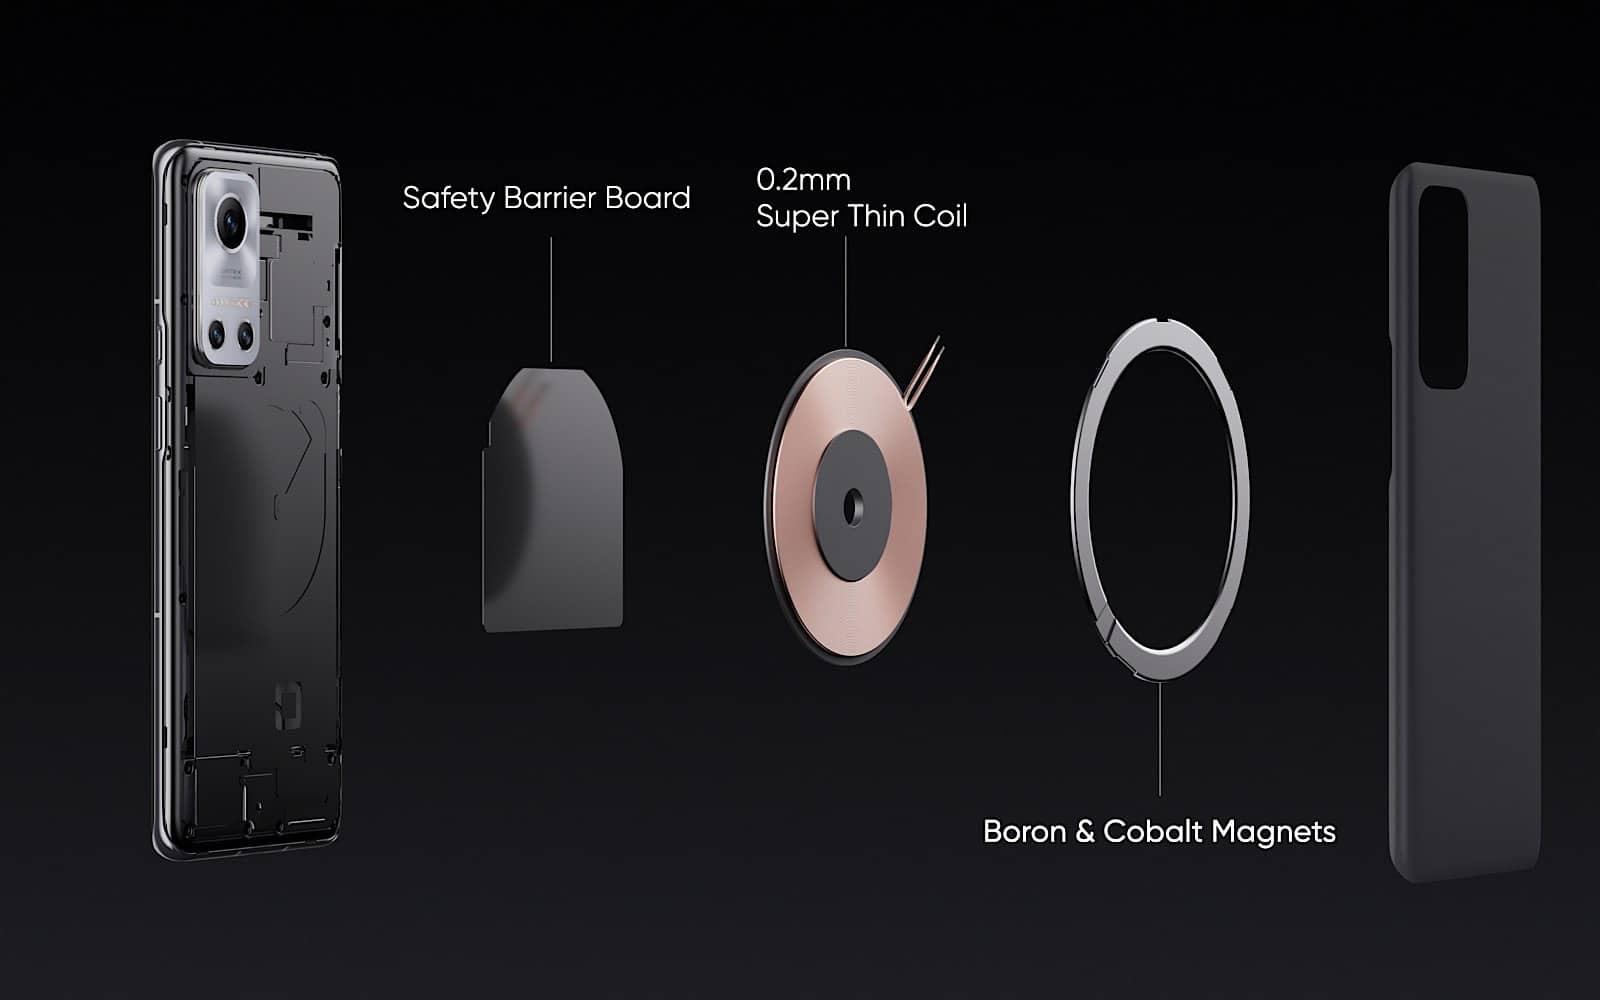 Realme's MagDart technology